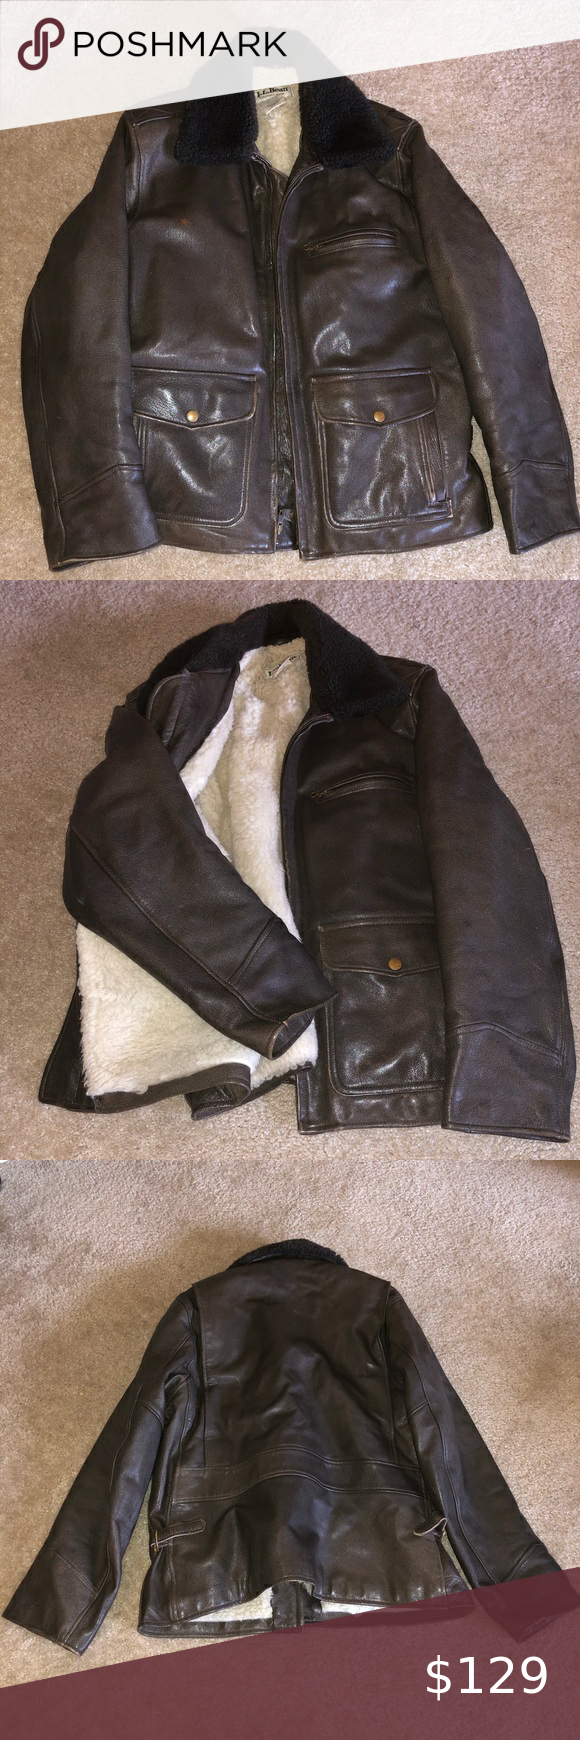 Ll Bean Leather Bomber Jacket Leather Bomber Jacket Leather Bomber Clothes Design